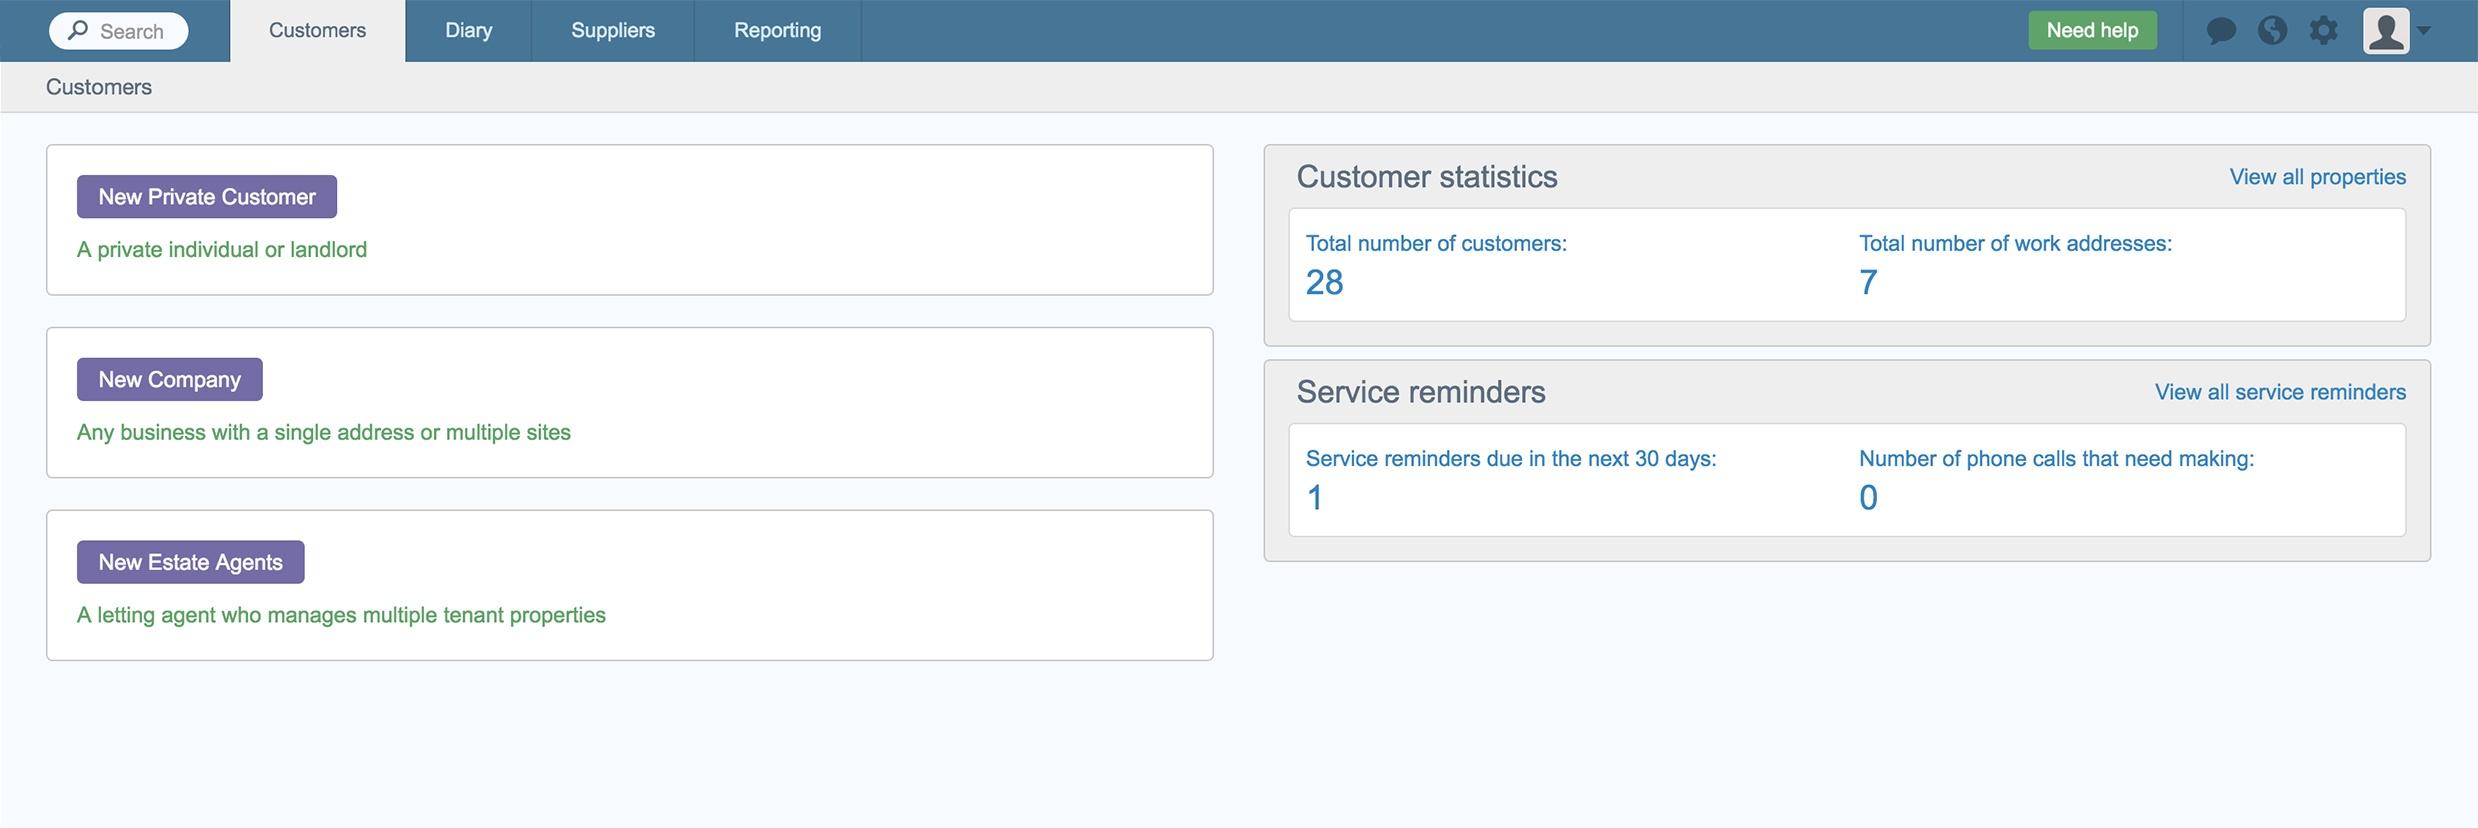 commusofts-job-management-software-customer-tab.jpg